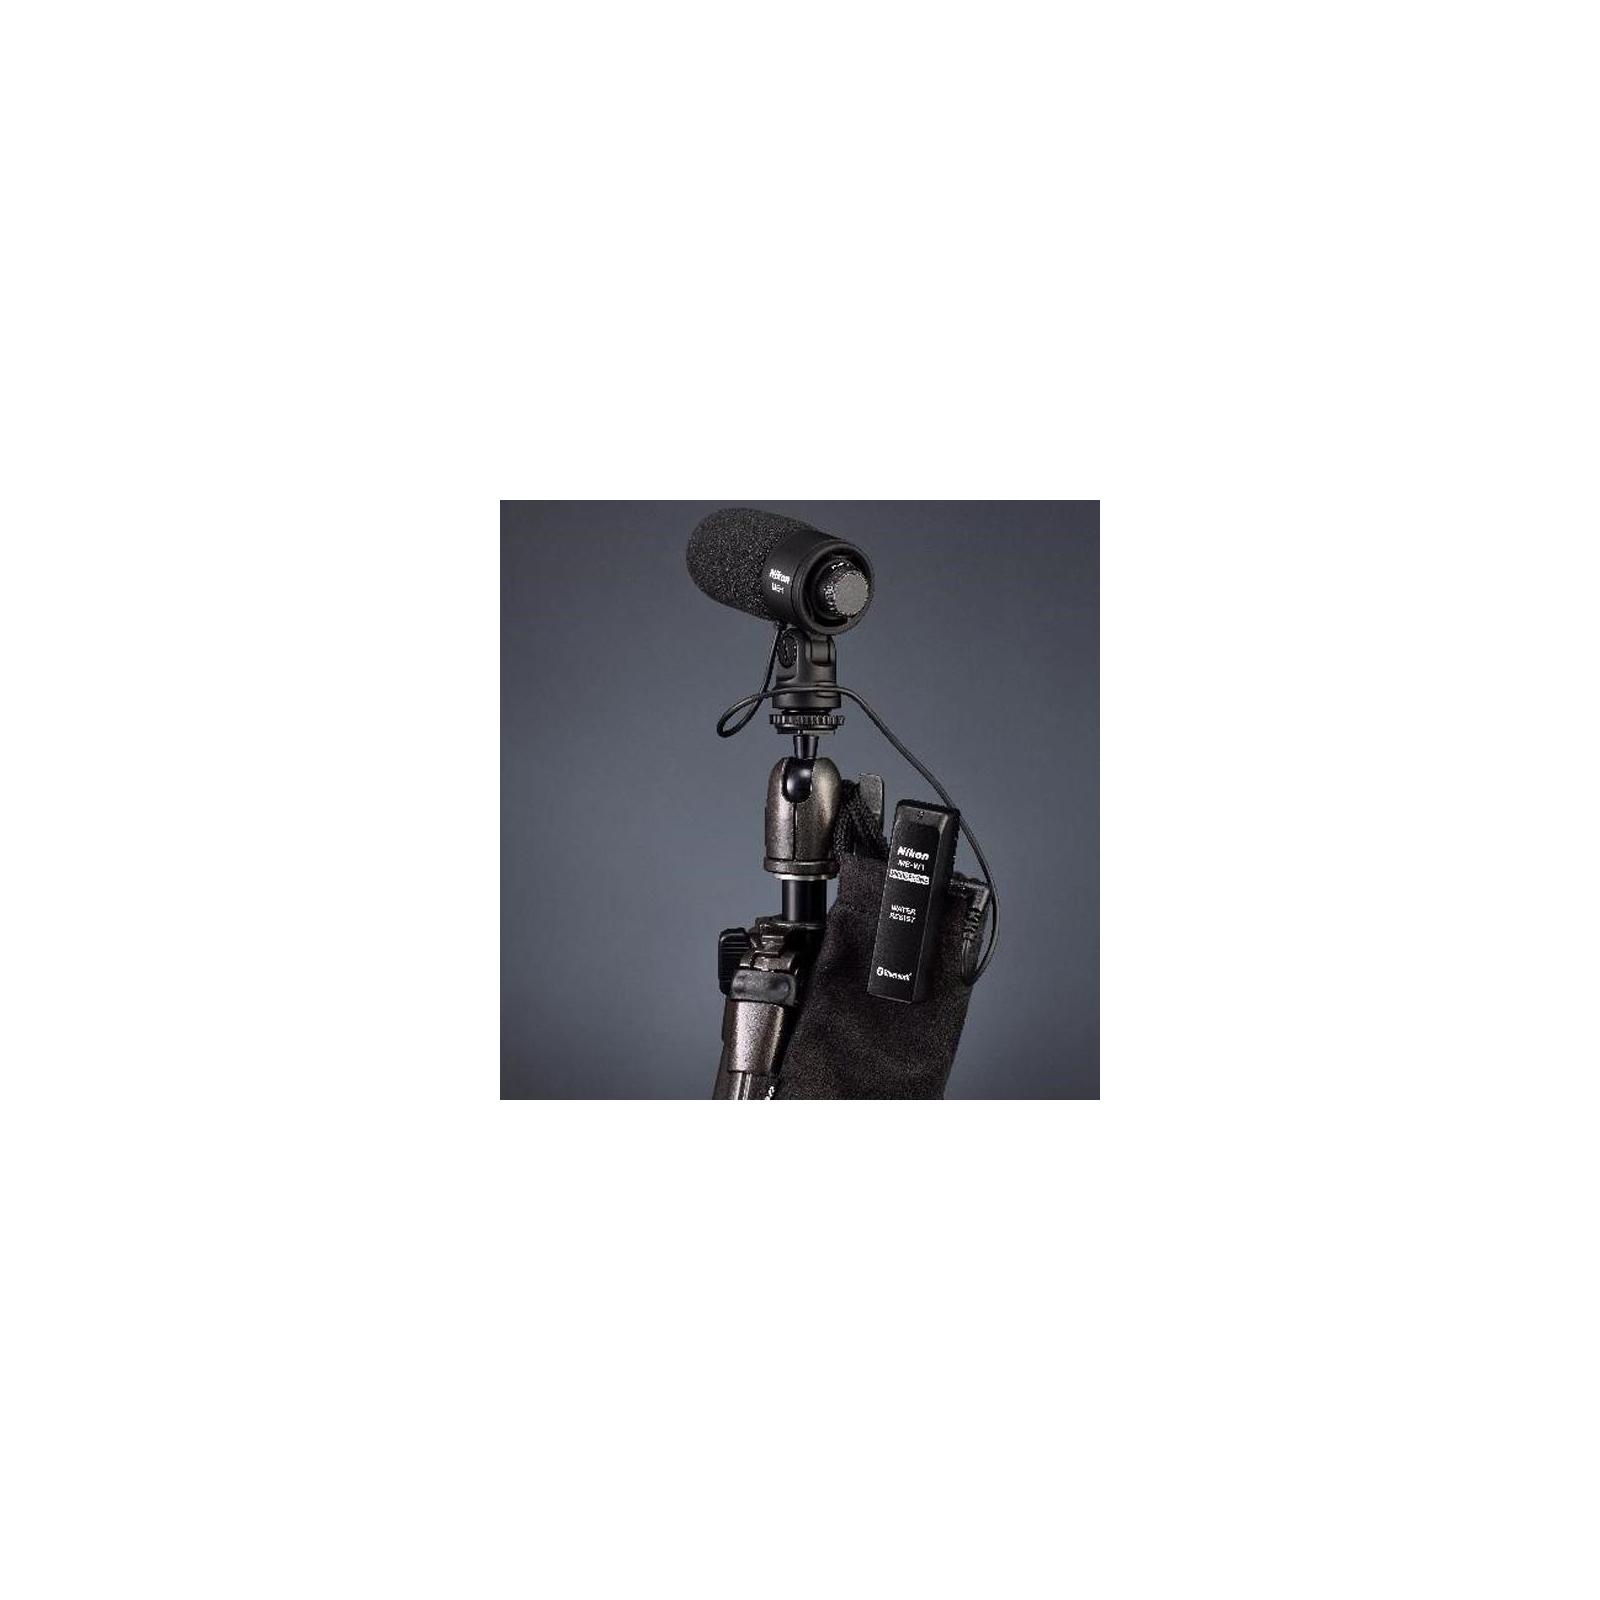 Микрофон Nikon ME-W1 Wireless Microphone (VWA105AE) изображение 3